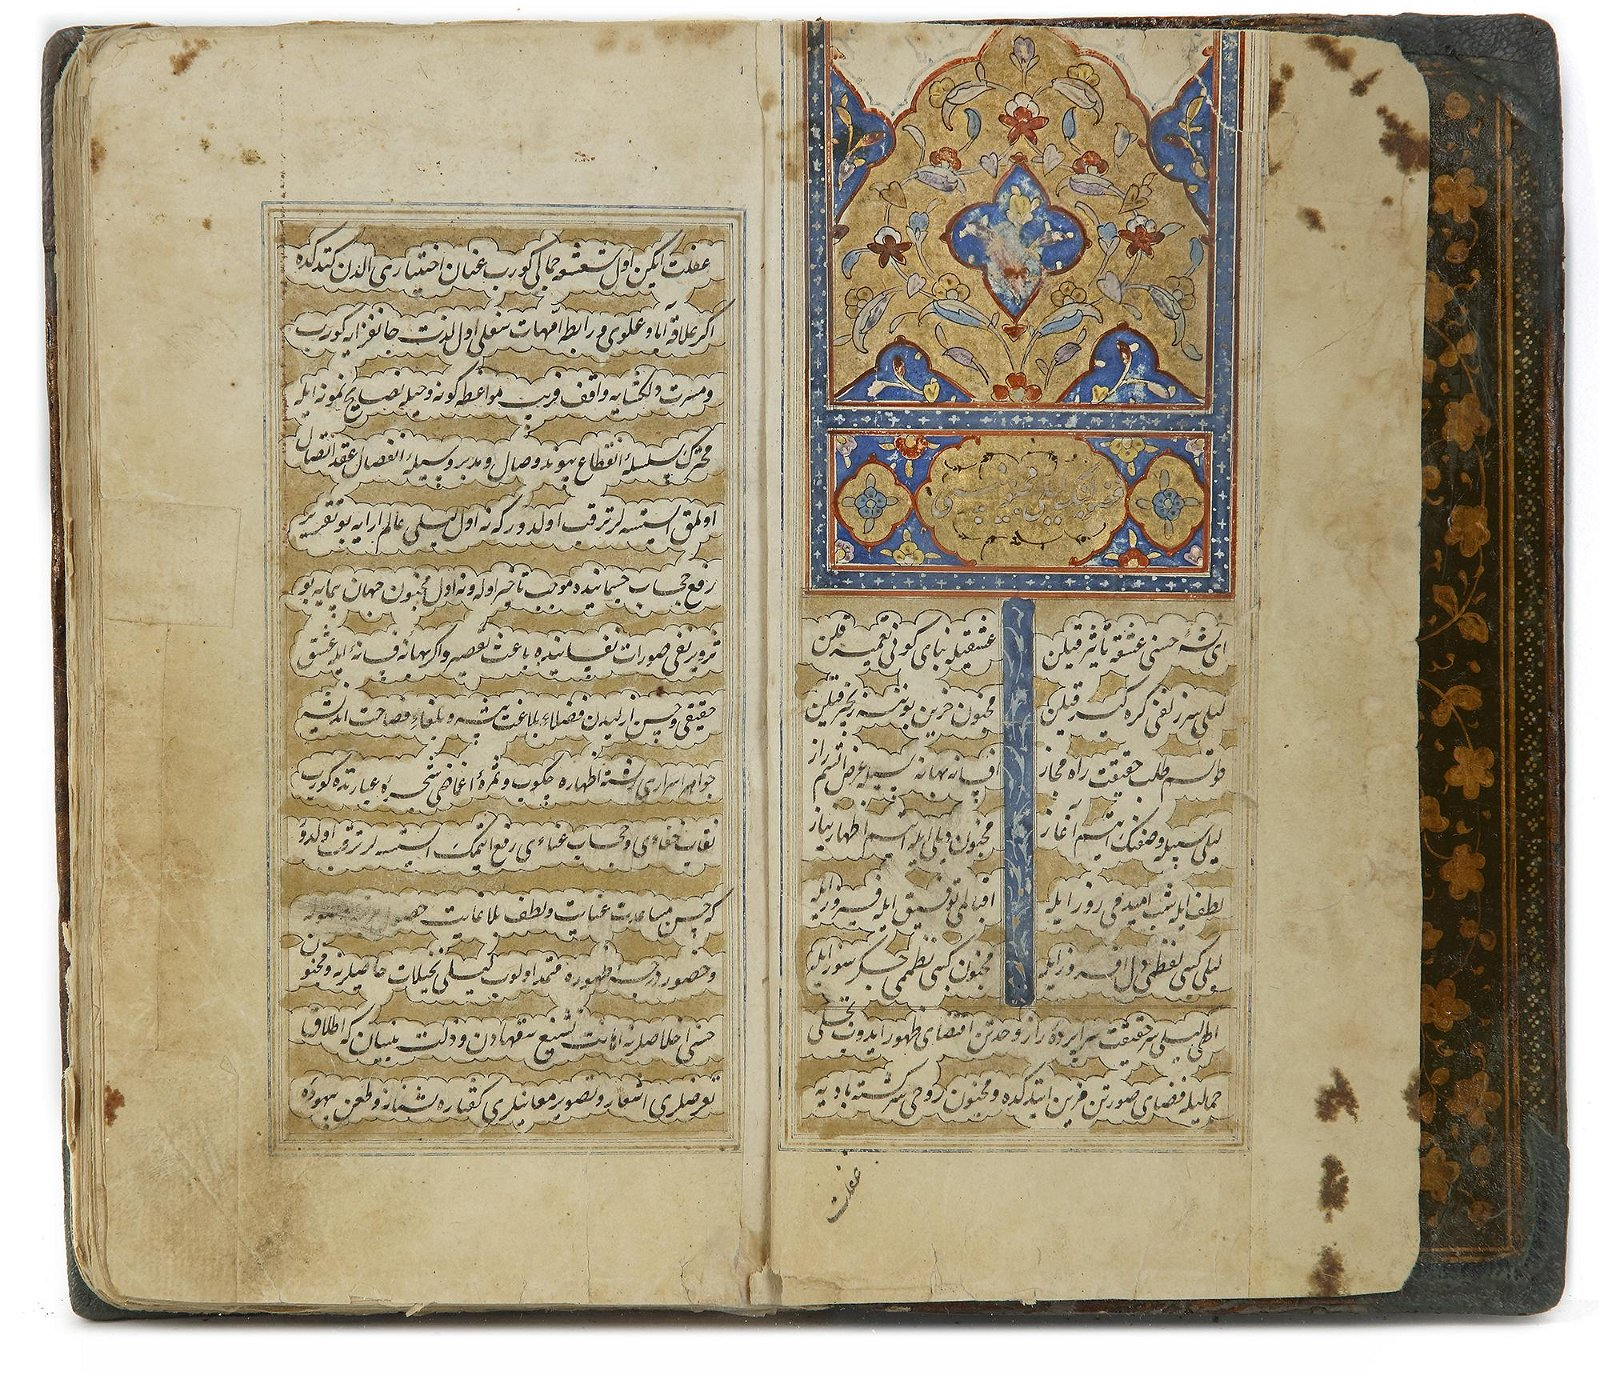 MUHAMMAD B. SULAIMAN FUZULI (DIED IN 1526) LAILA WA